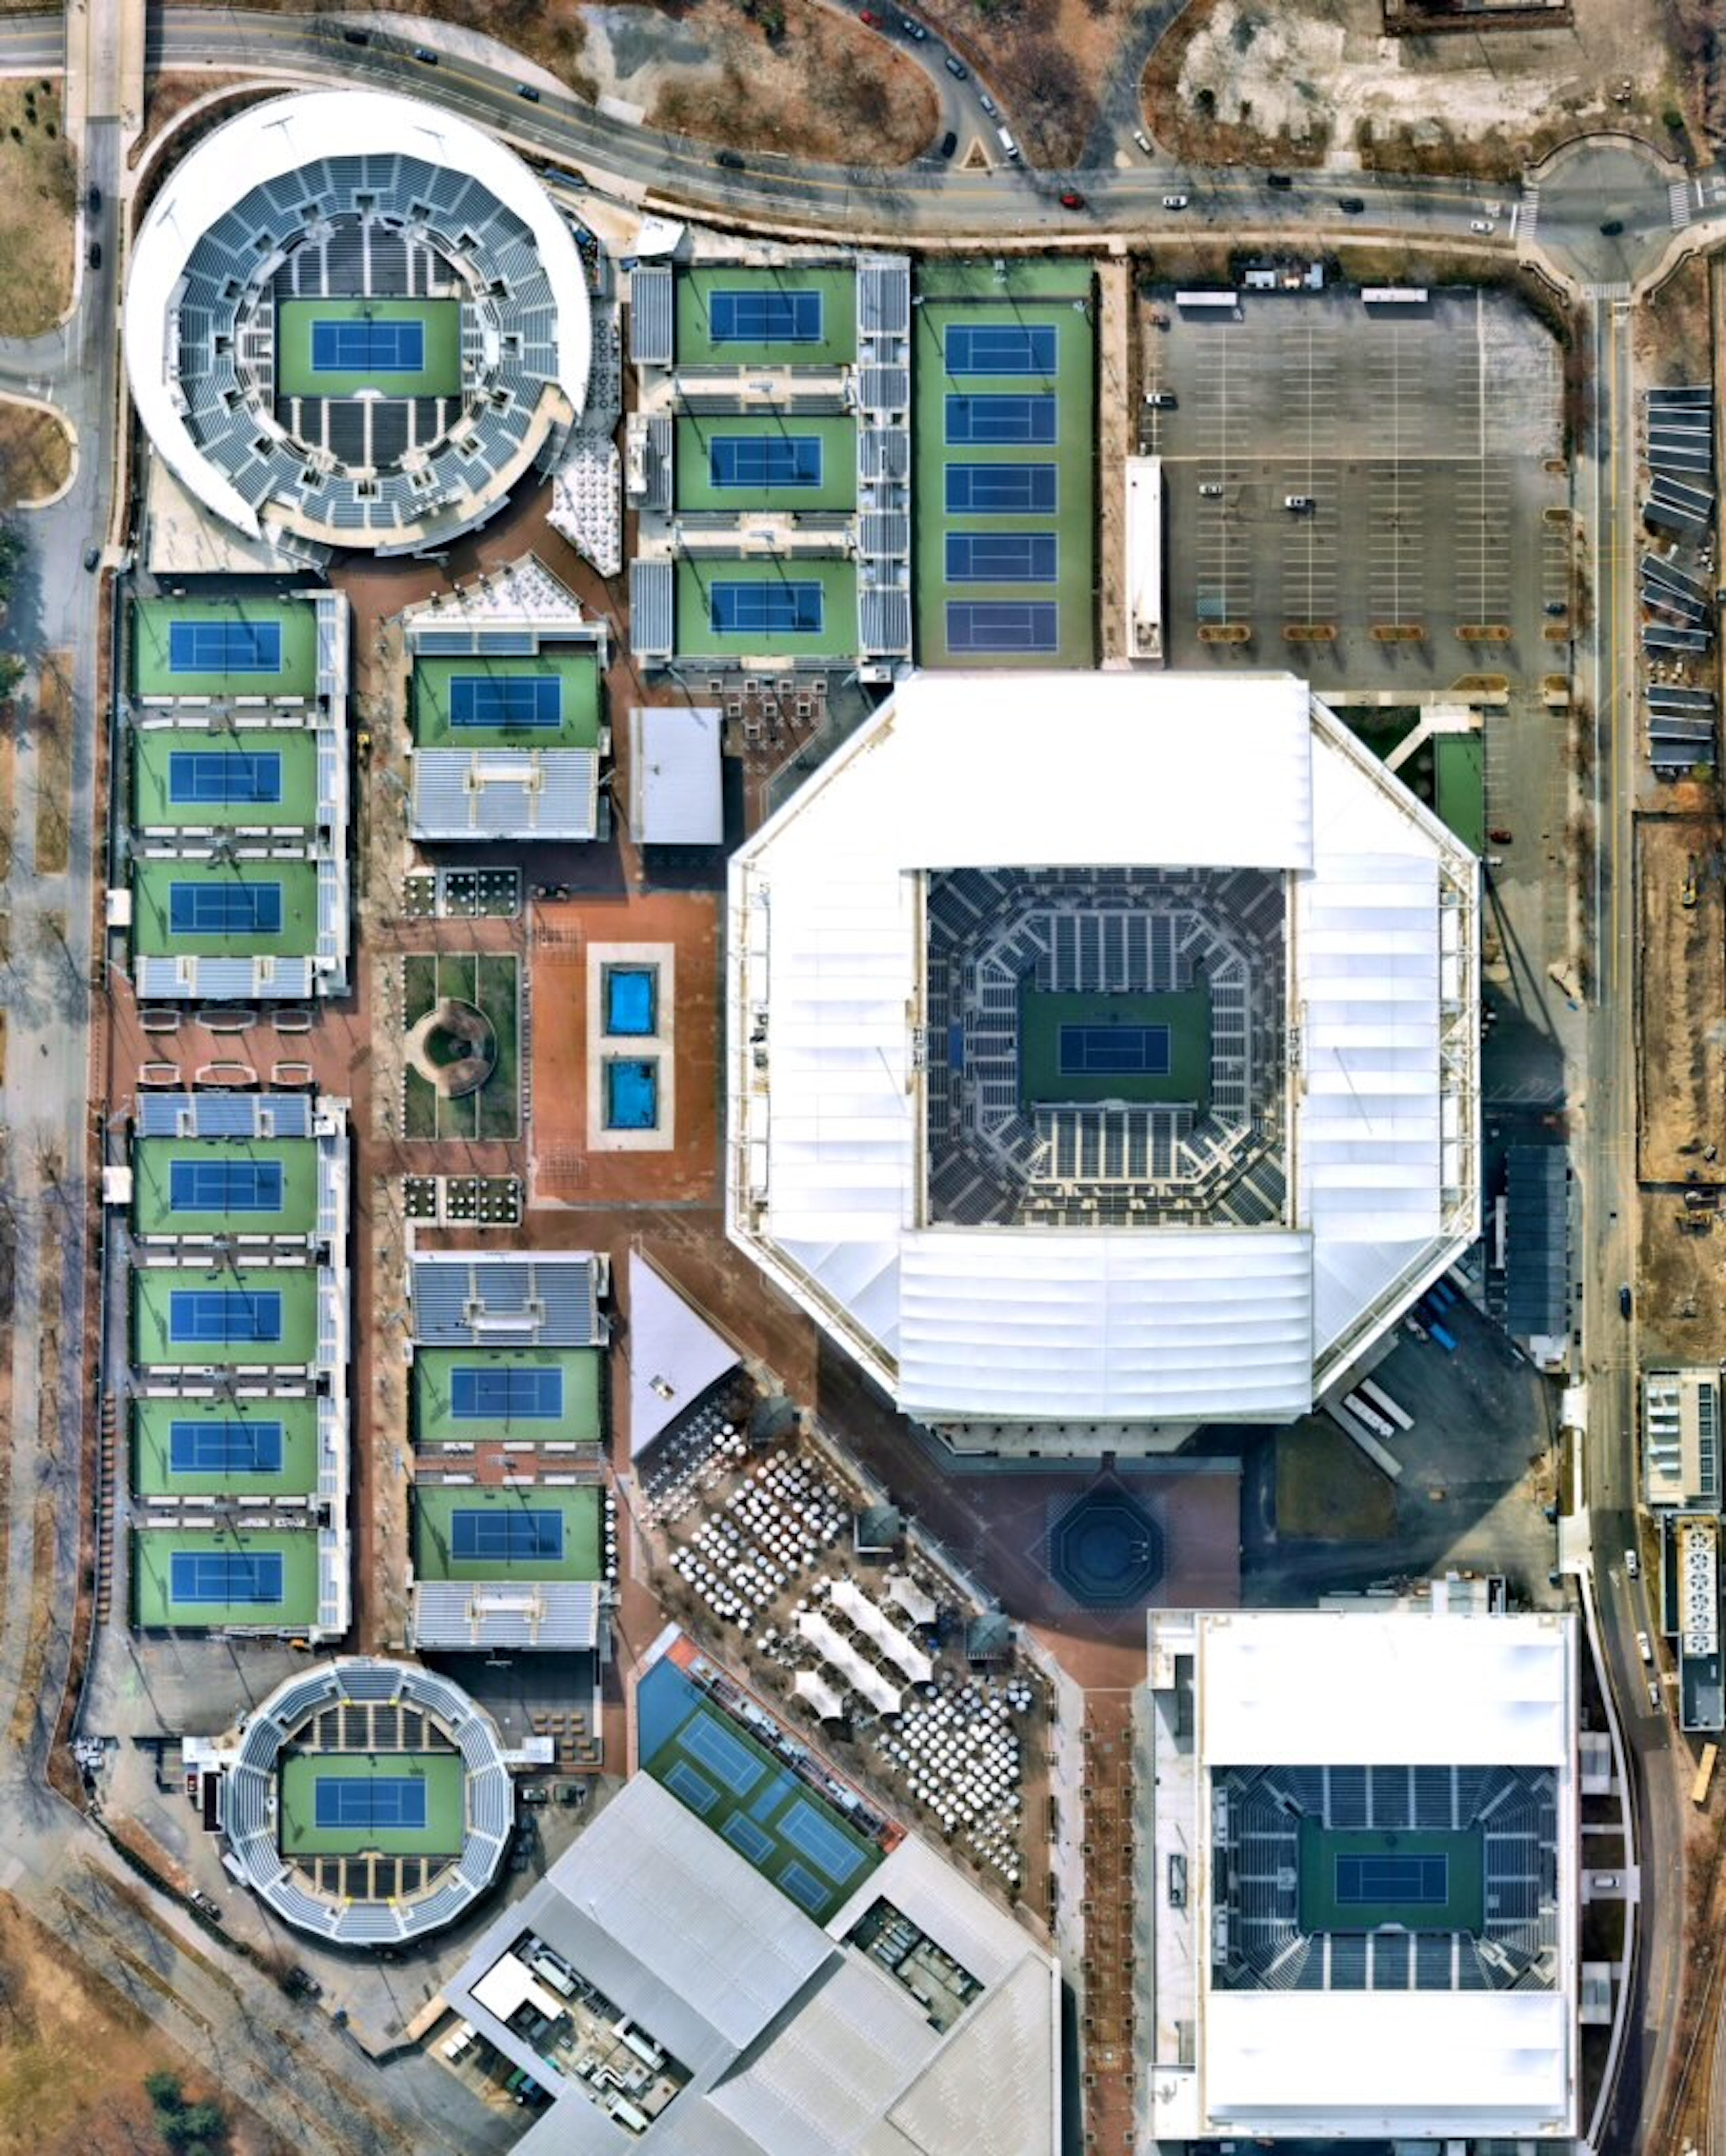 Billie Jean King National Tennis Center